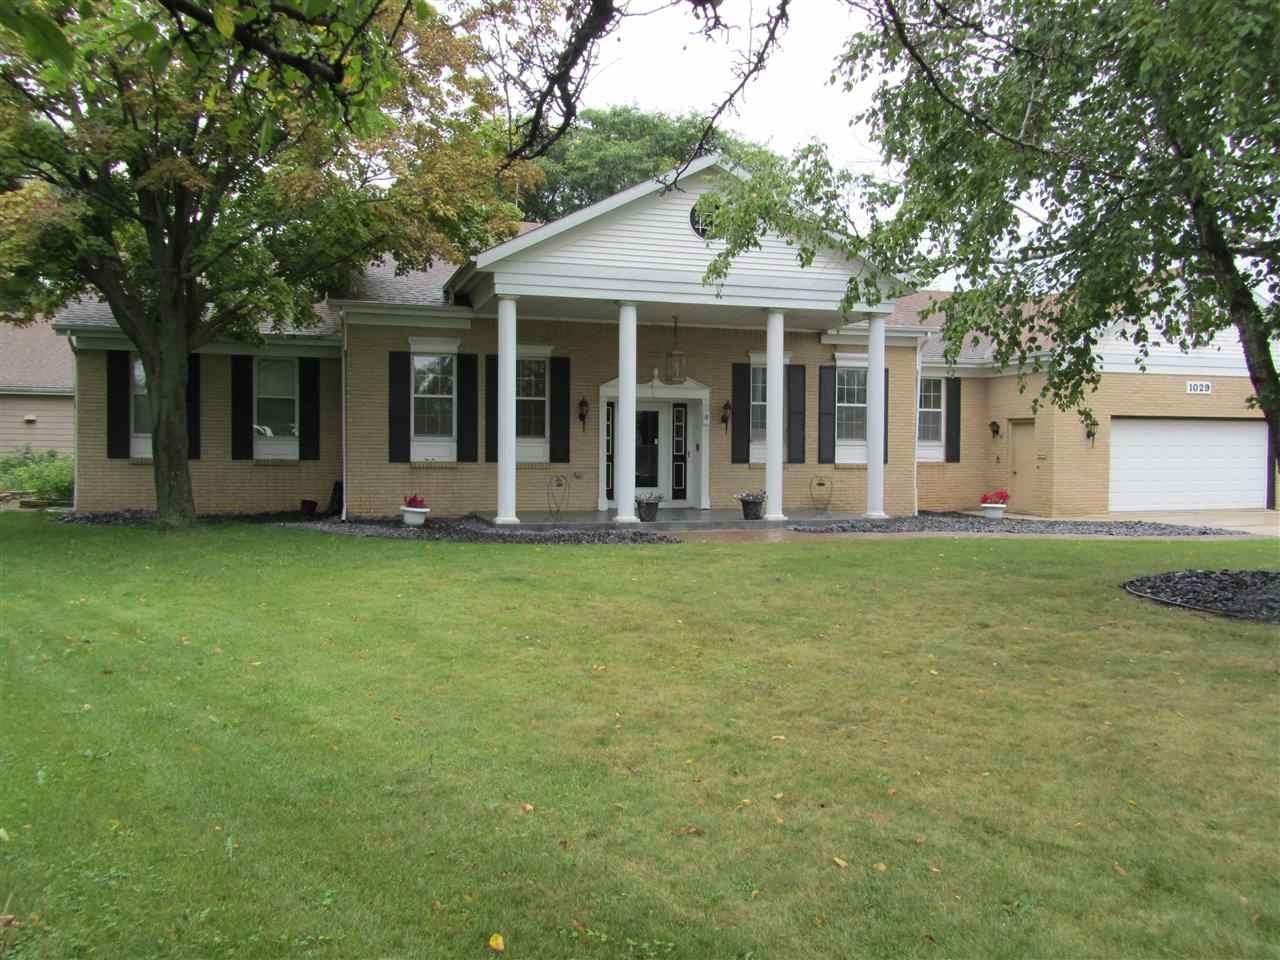 1029 ASHBURY Court, Fond du Lac, WI 54935 - MLS#: 50245641